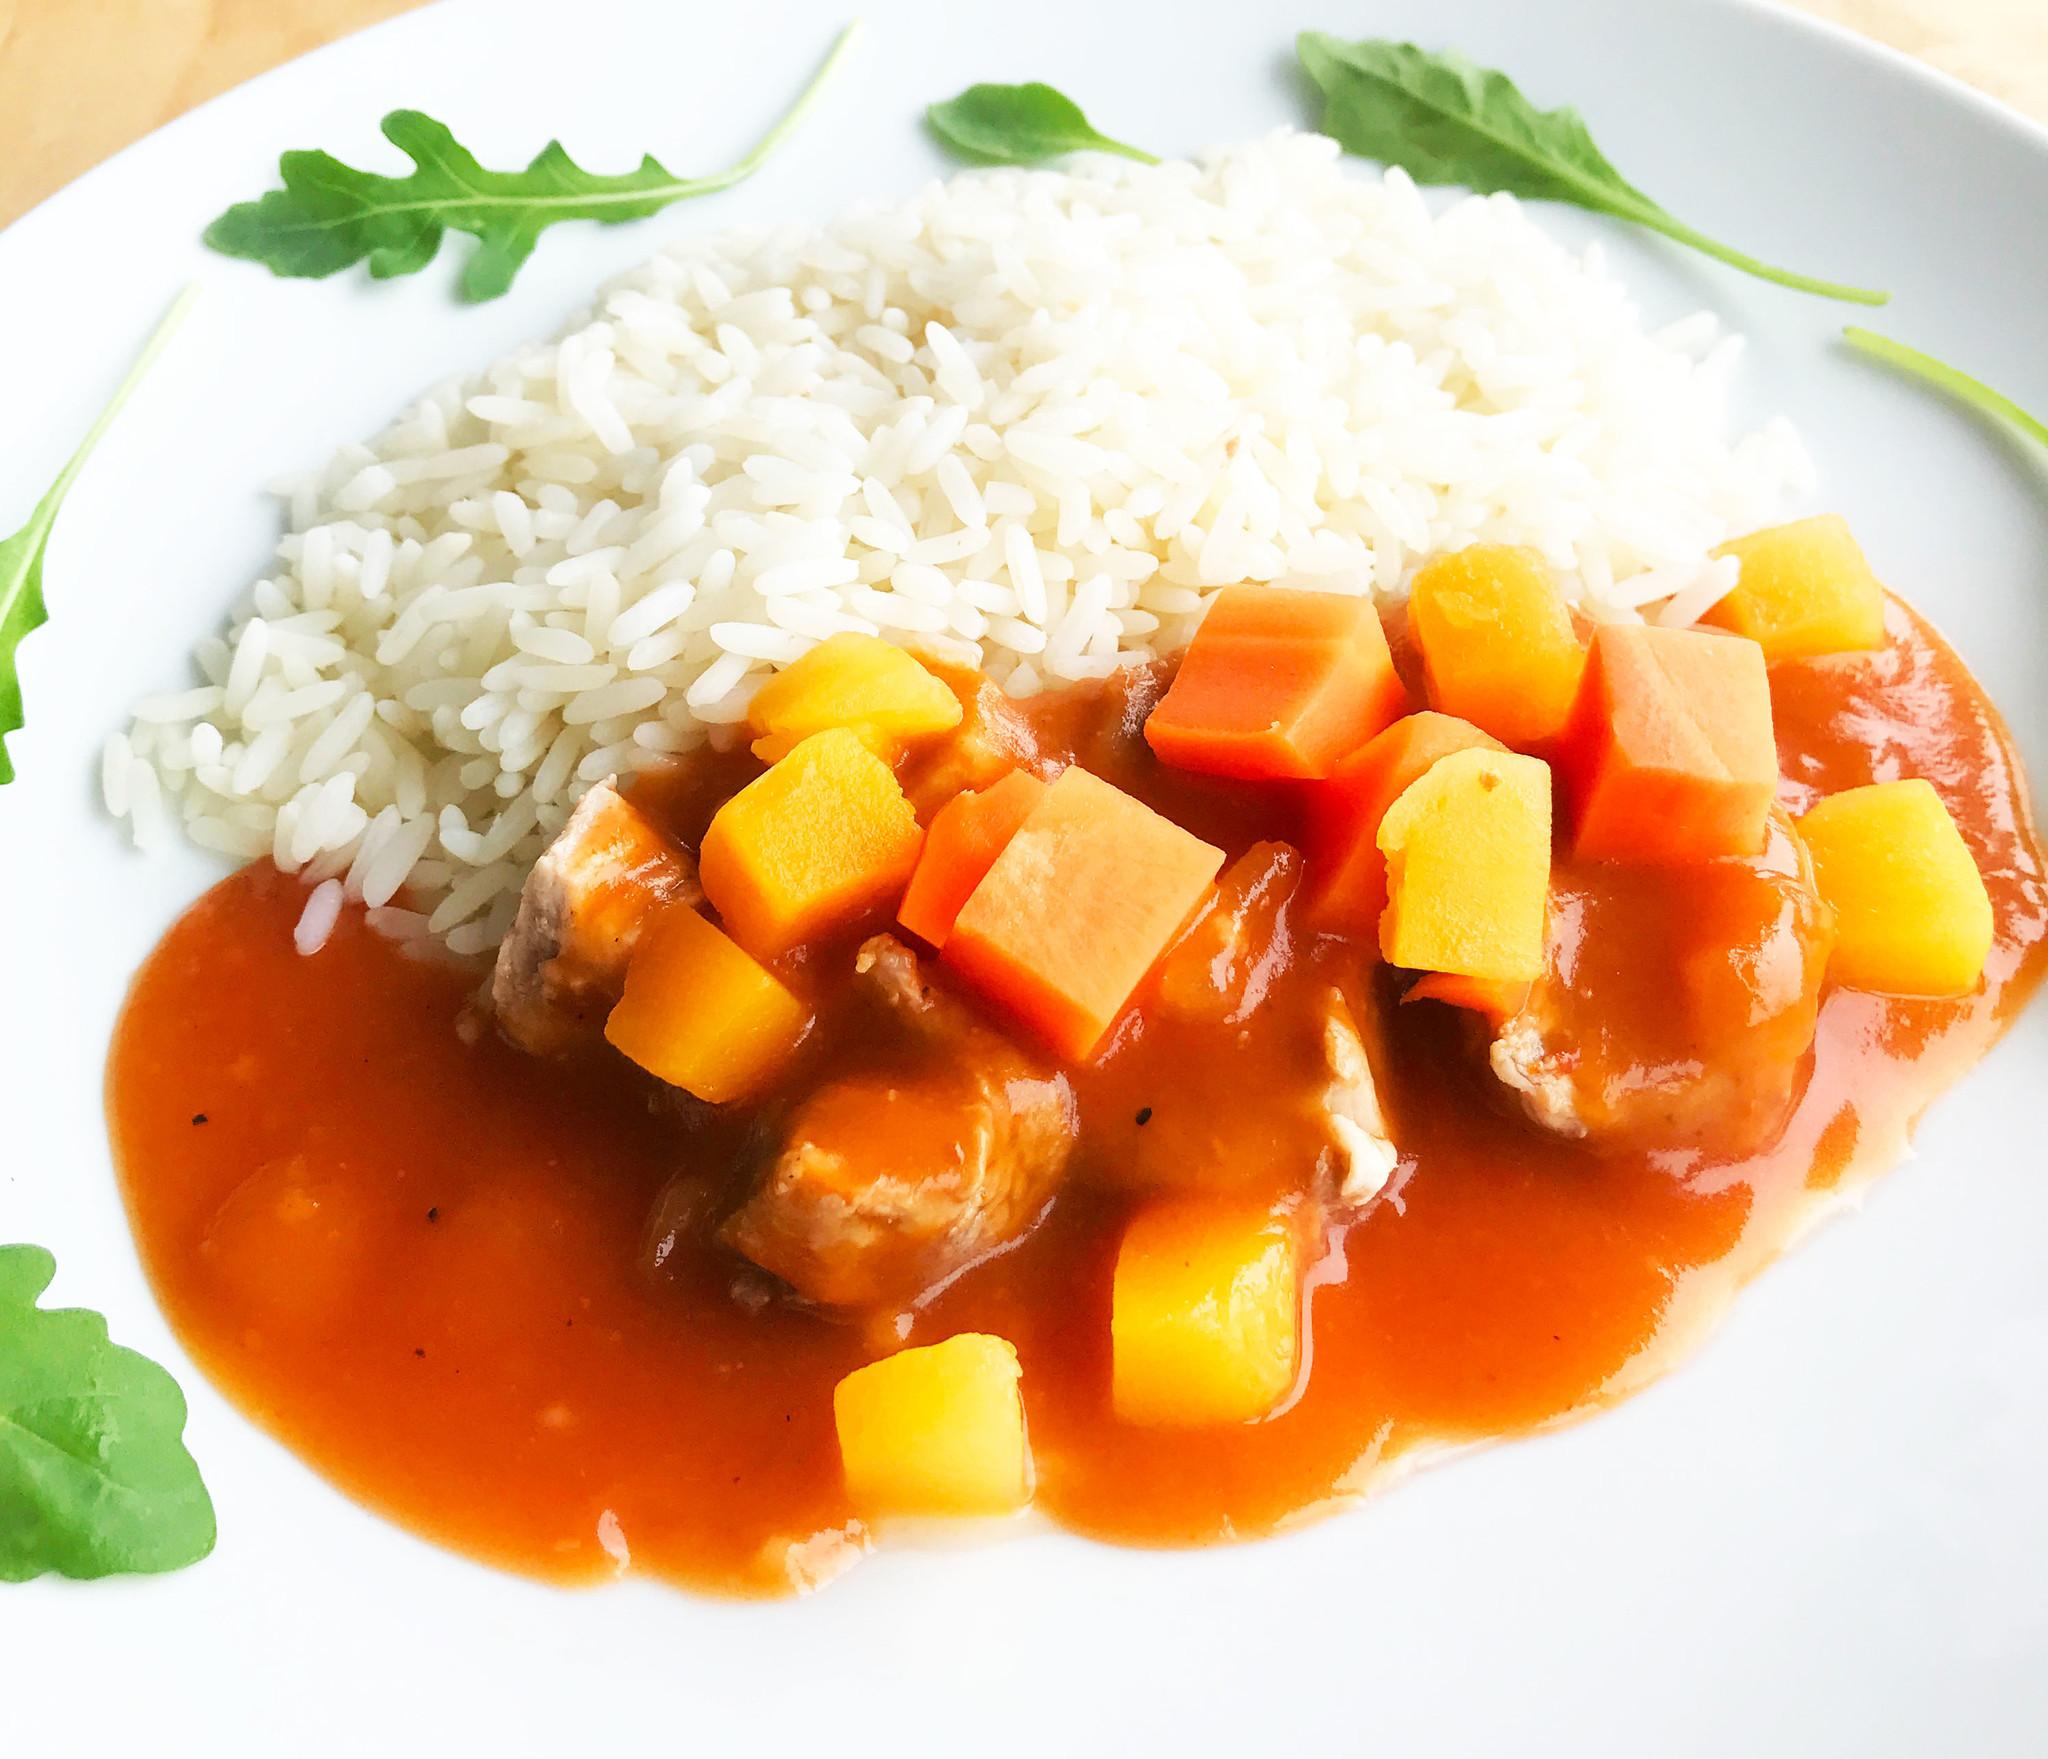 Pork tenderloin, BBQ sauce, vegetables & rice (175g)